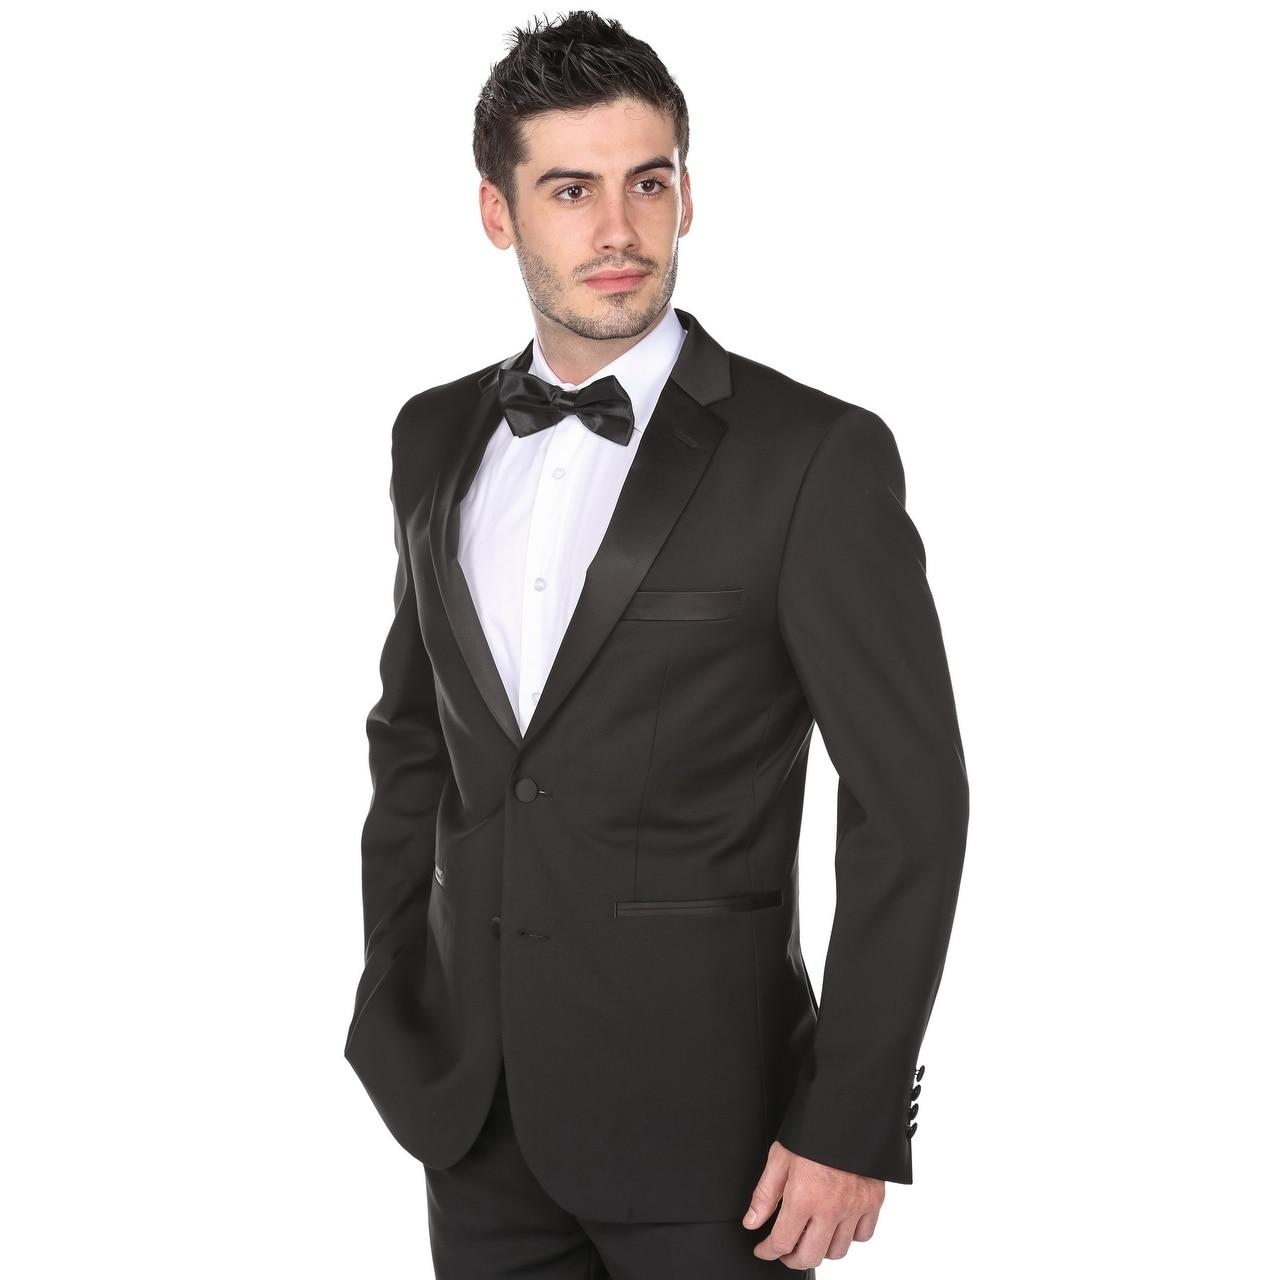 Gino Vitale Men S Clic Fit Notch Lapel Tuxedo On Free Shipping Today 17626510